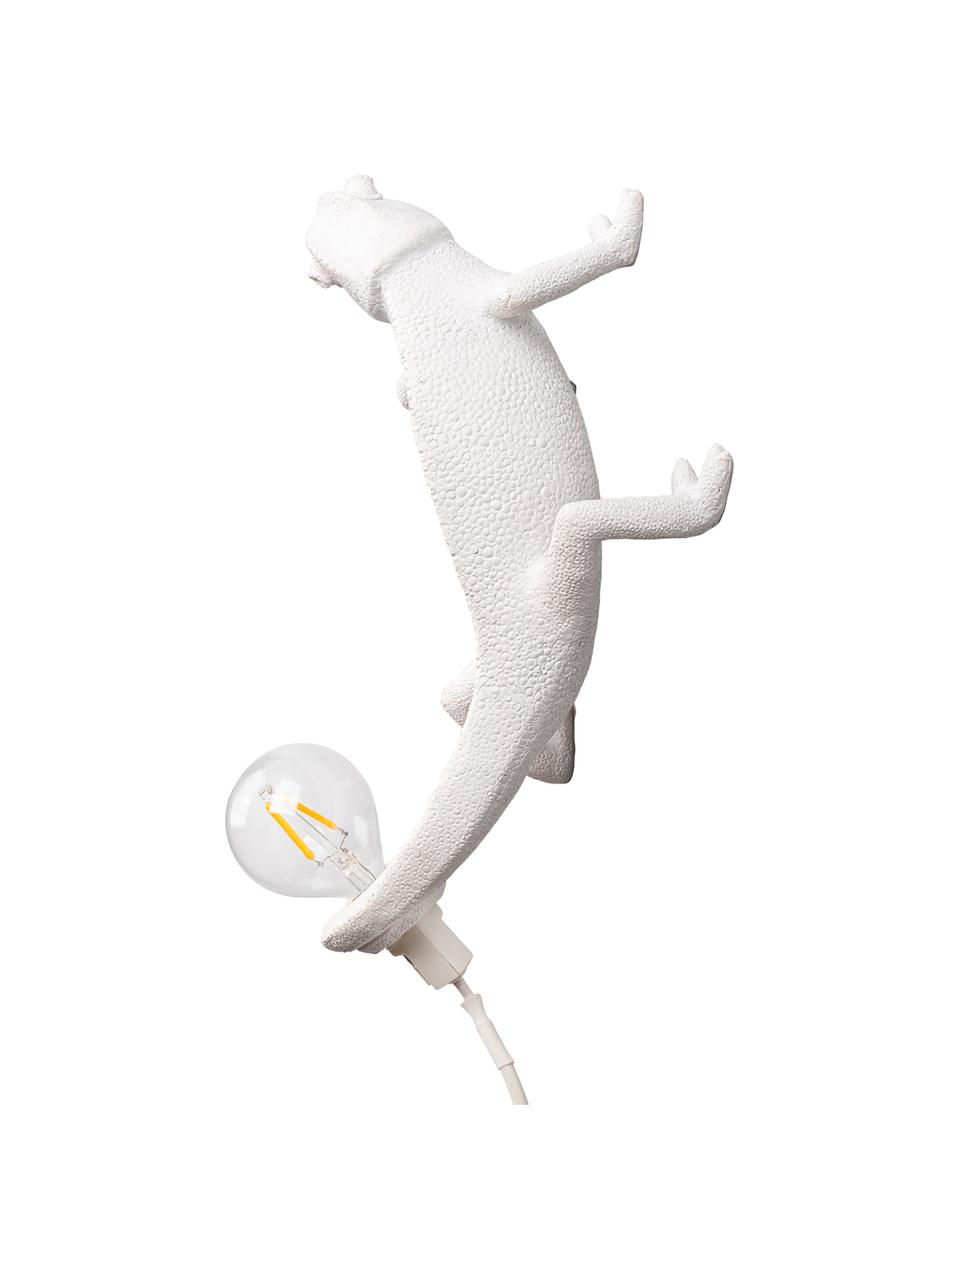 Applique con spina Chameleon, Lampada: poliresina, Bianco, Larg. 7 x Alt. 17 cm